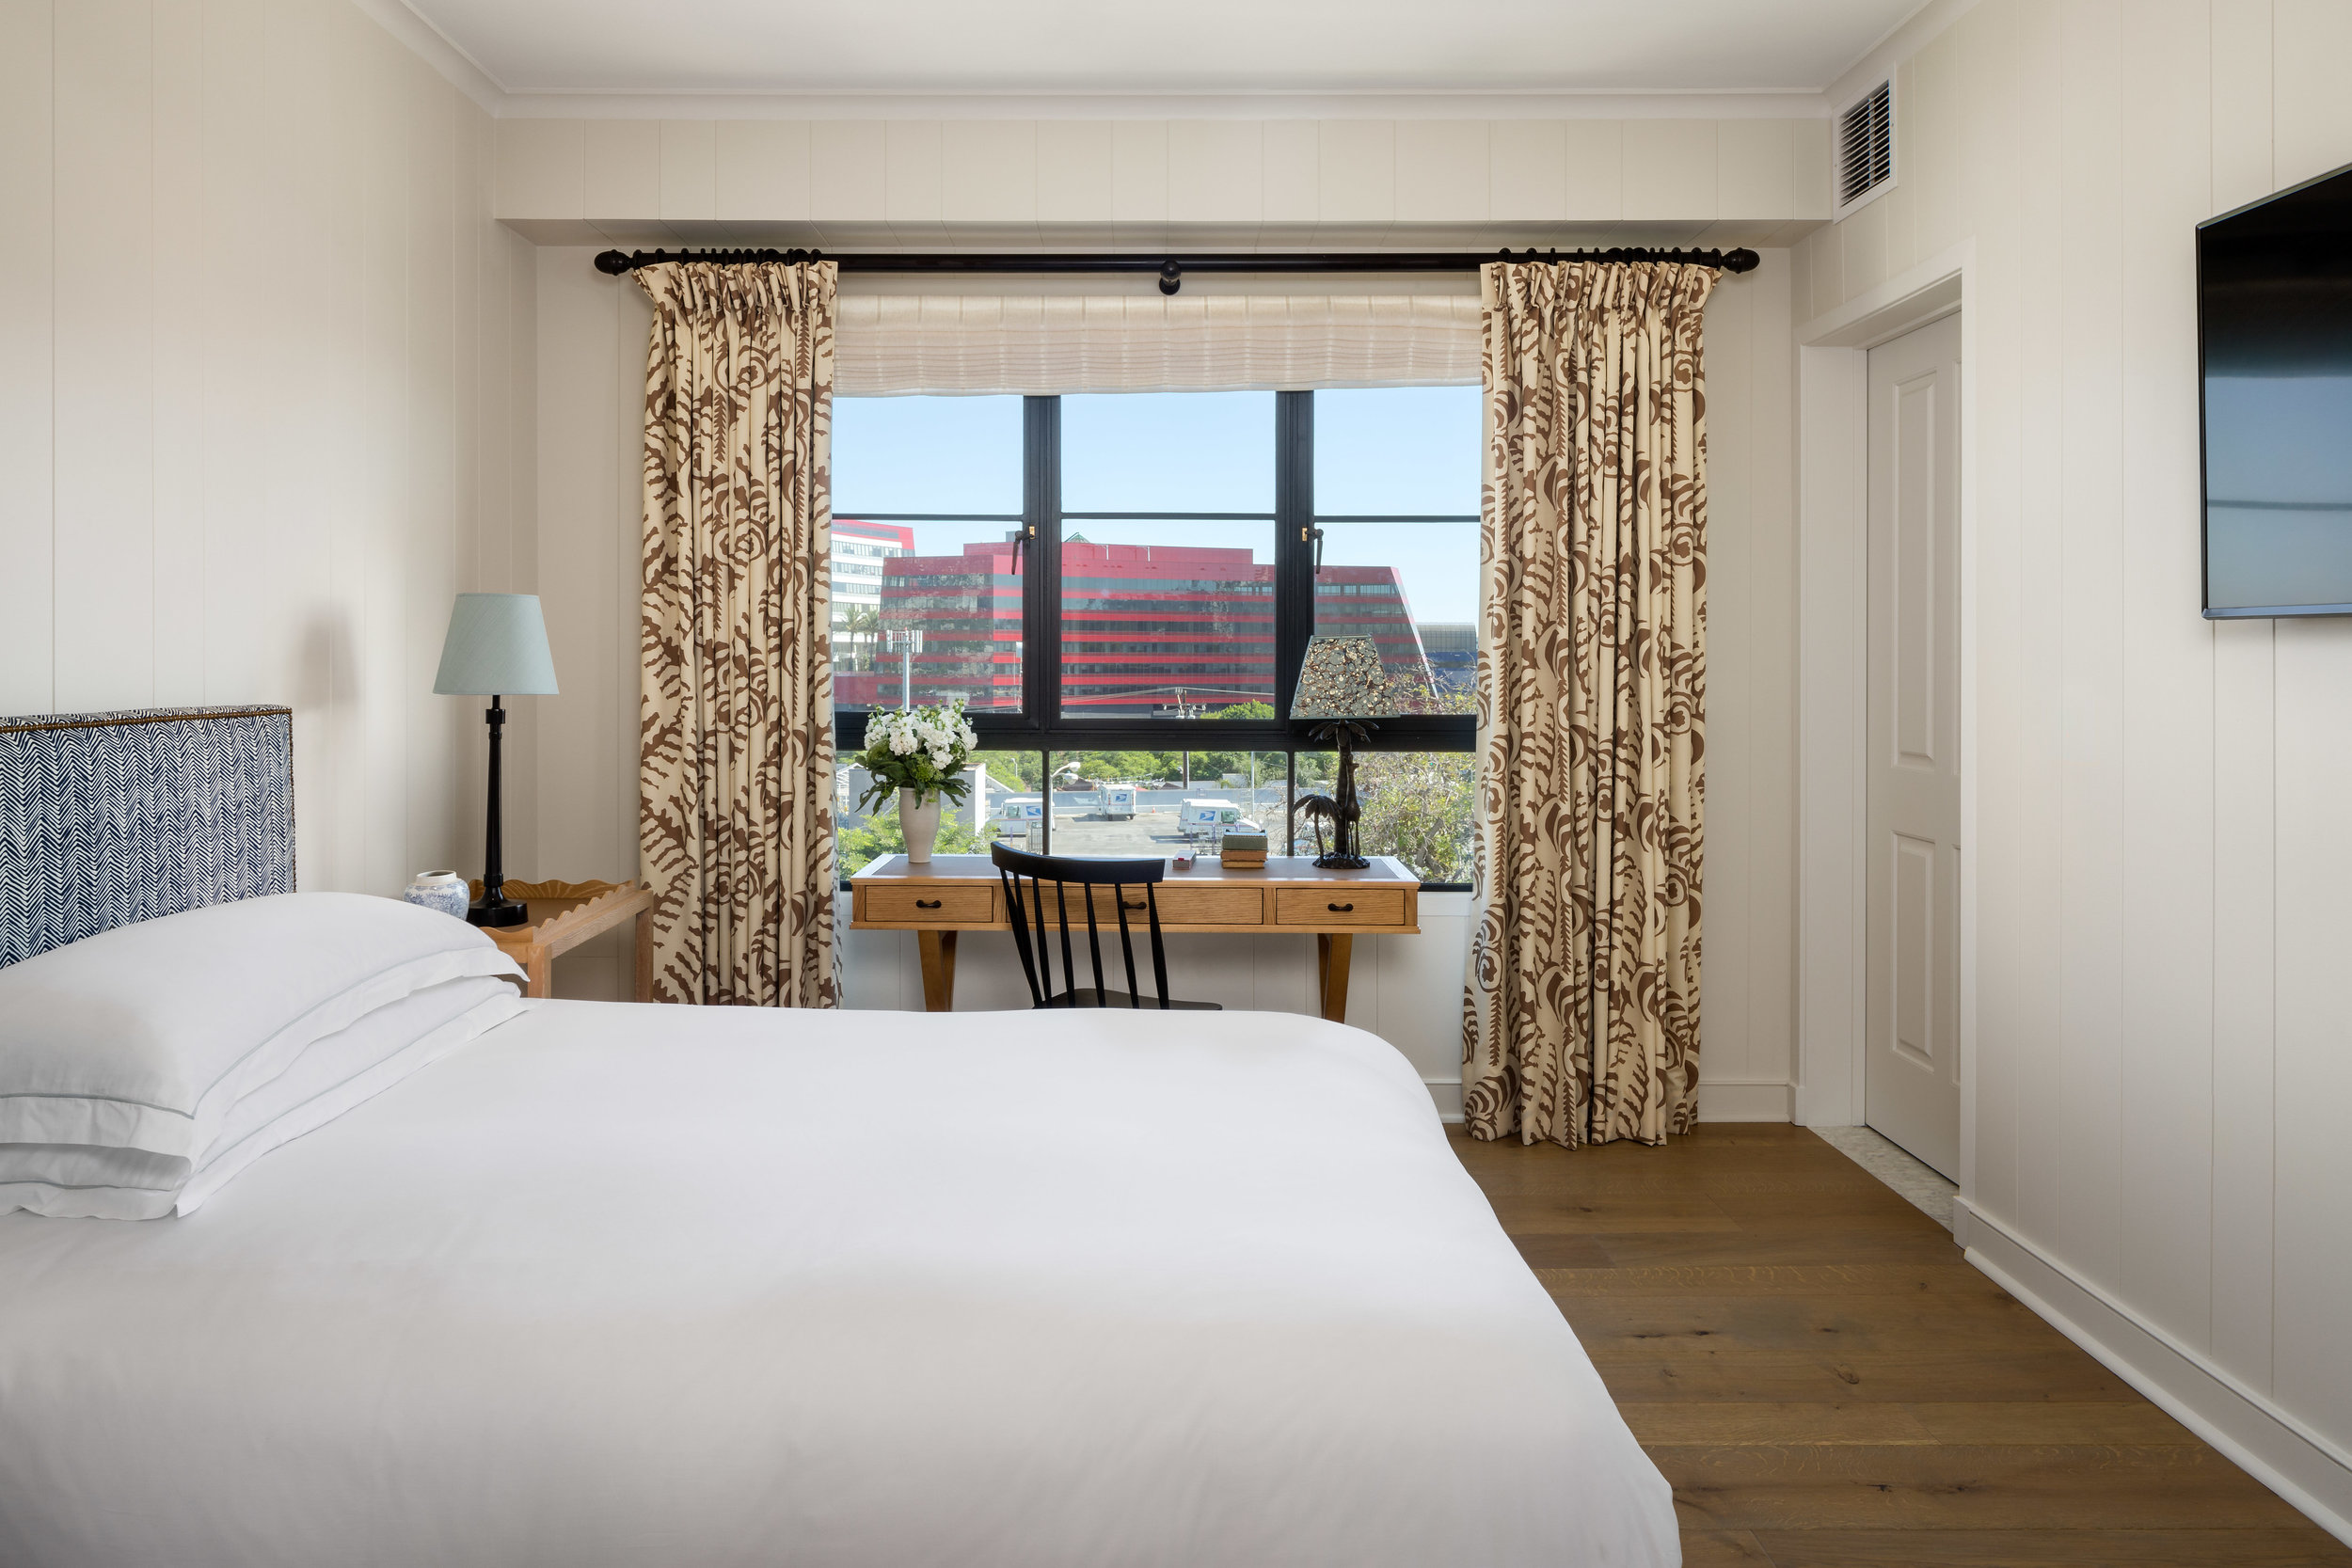 PIXELLAB_850 HOTEL-2PXLB2090_v2.jpg